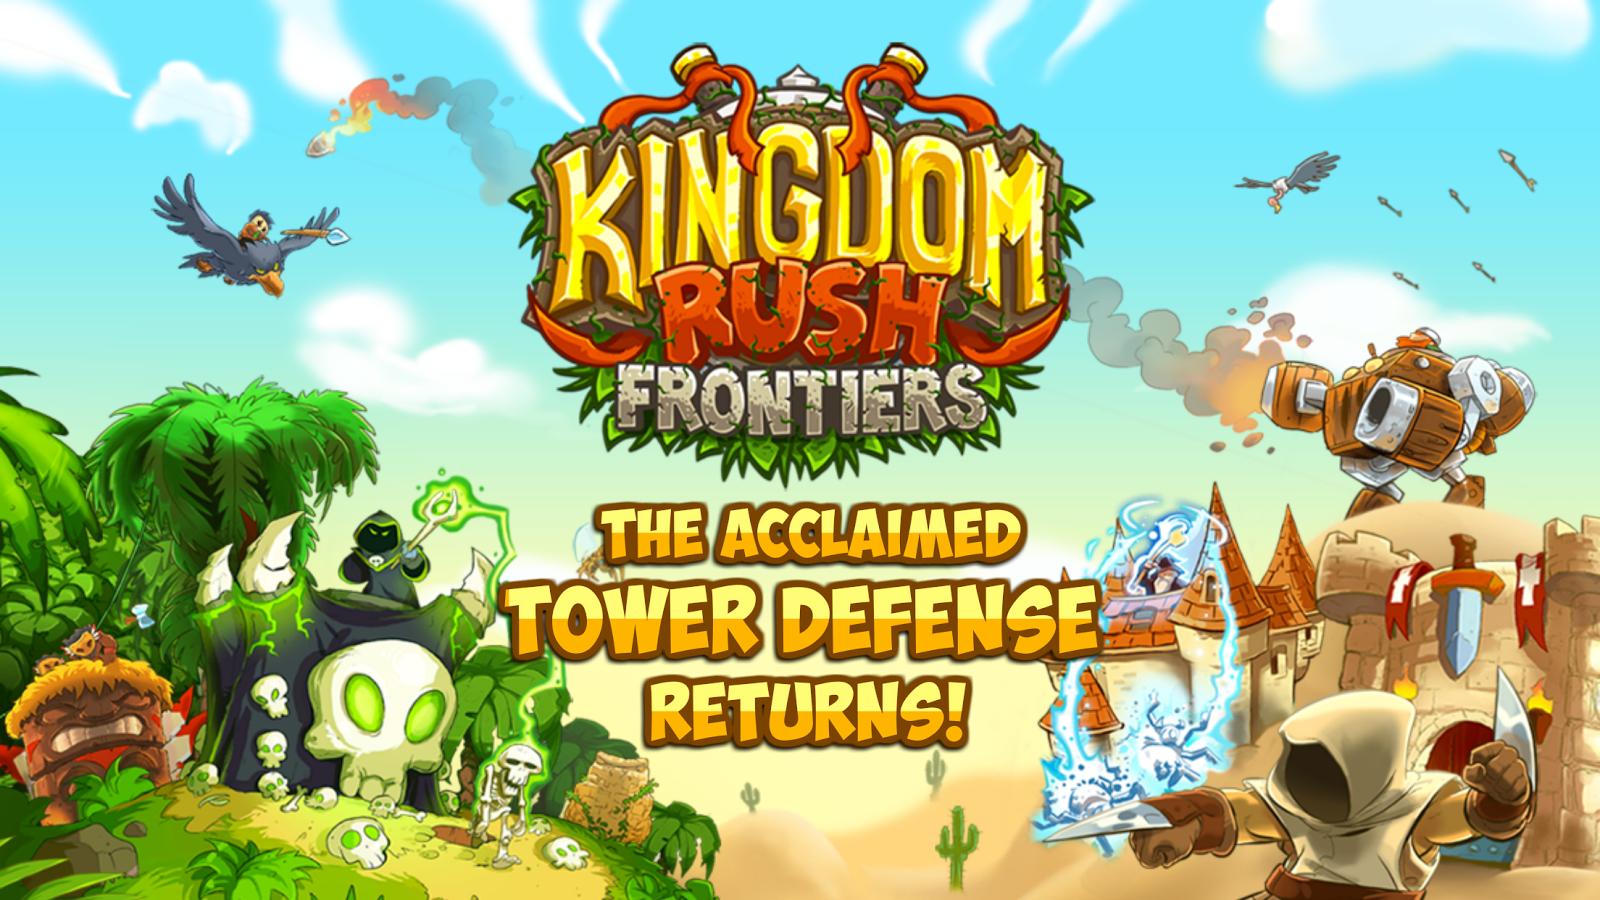 Kingdom Rush Frontiers Apk Oyun